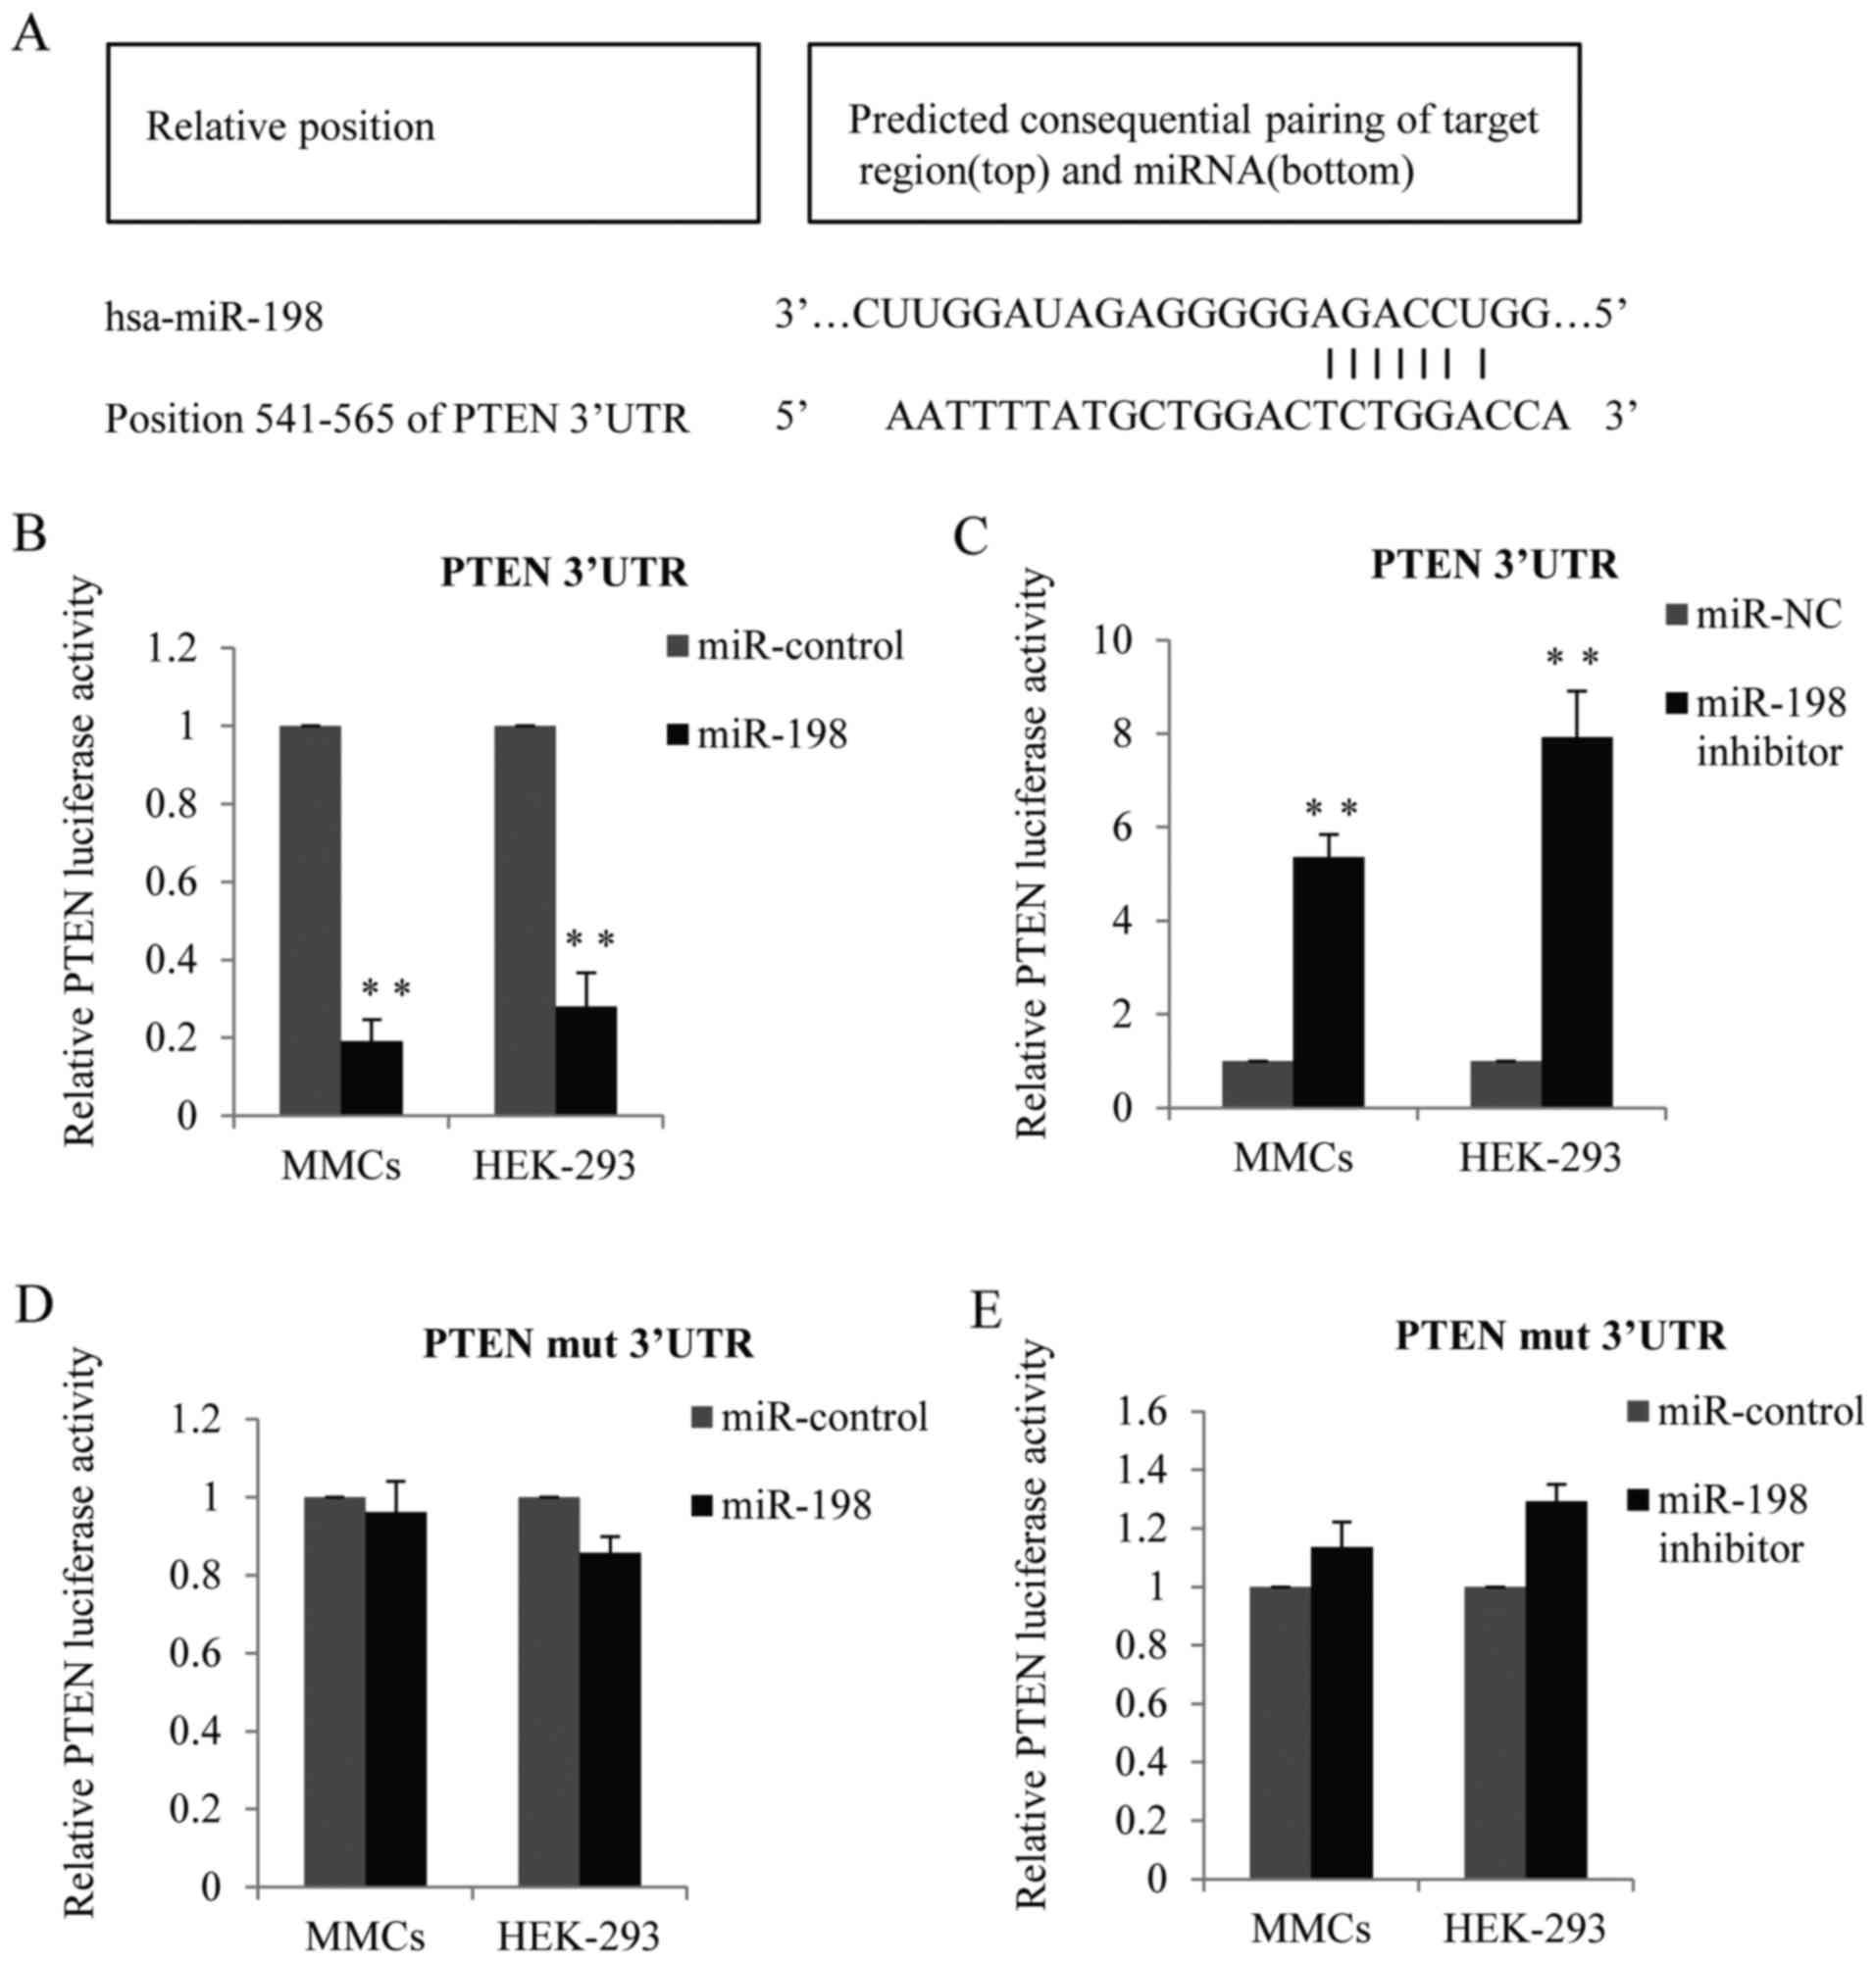 microrna u2011198 contributes to lupus nephritis progression by